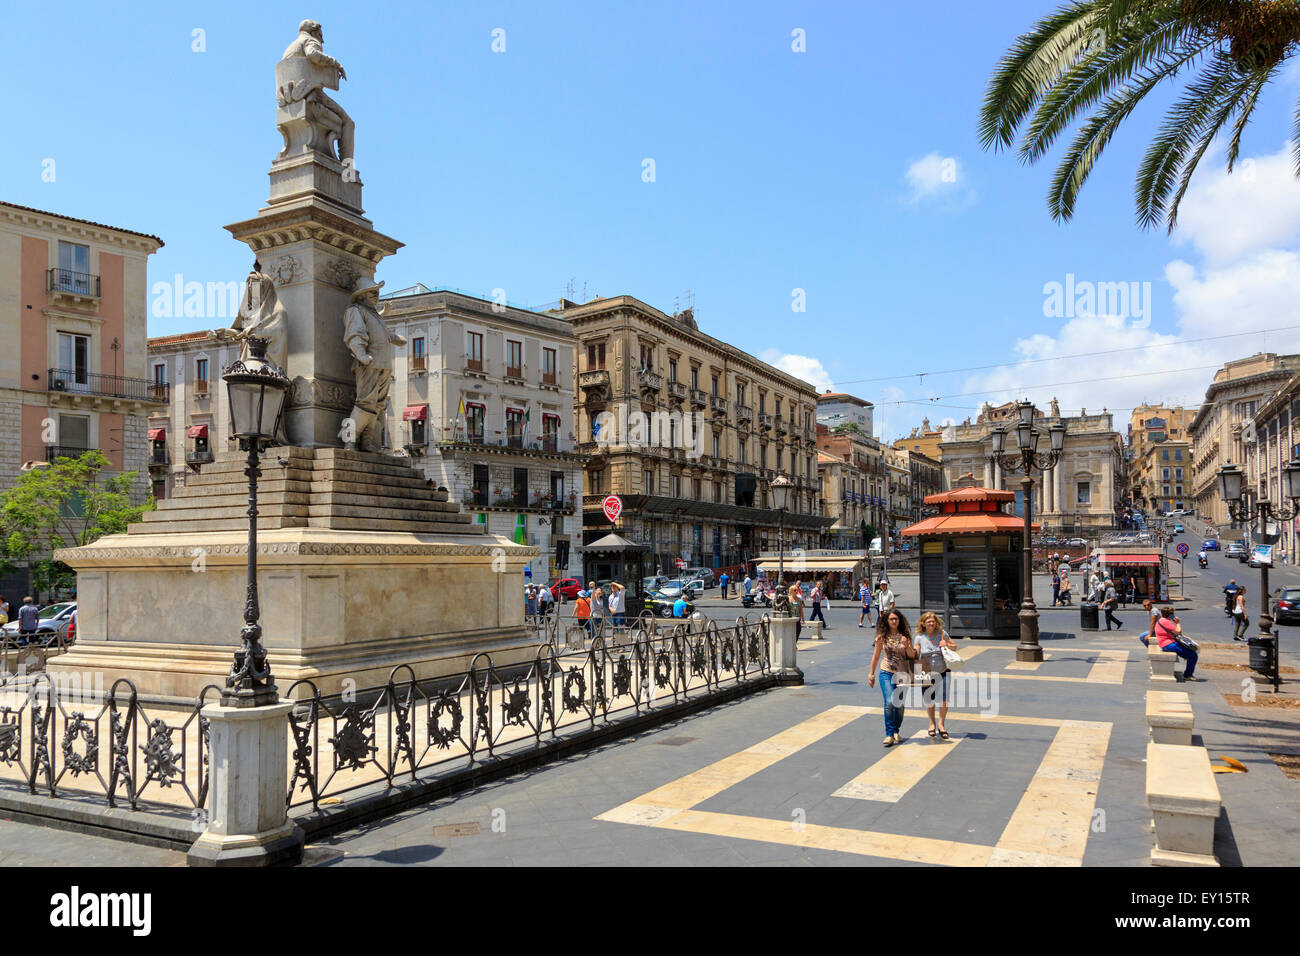 Piazza Stesicoro, Catania, Sizilien mit der Statue des 18. Jahrhunderts Opernkomponisten Vincenzo Bellini geboren Stockbild